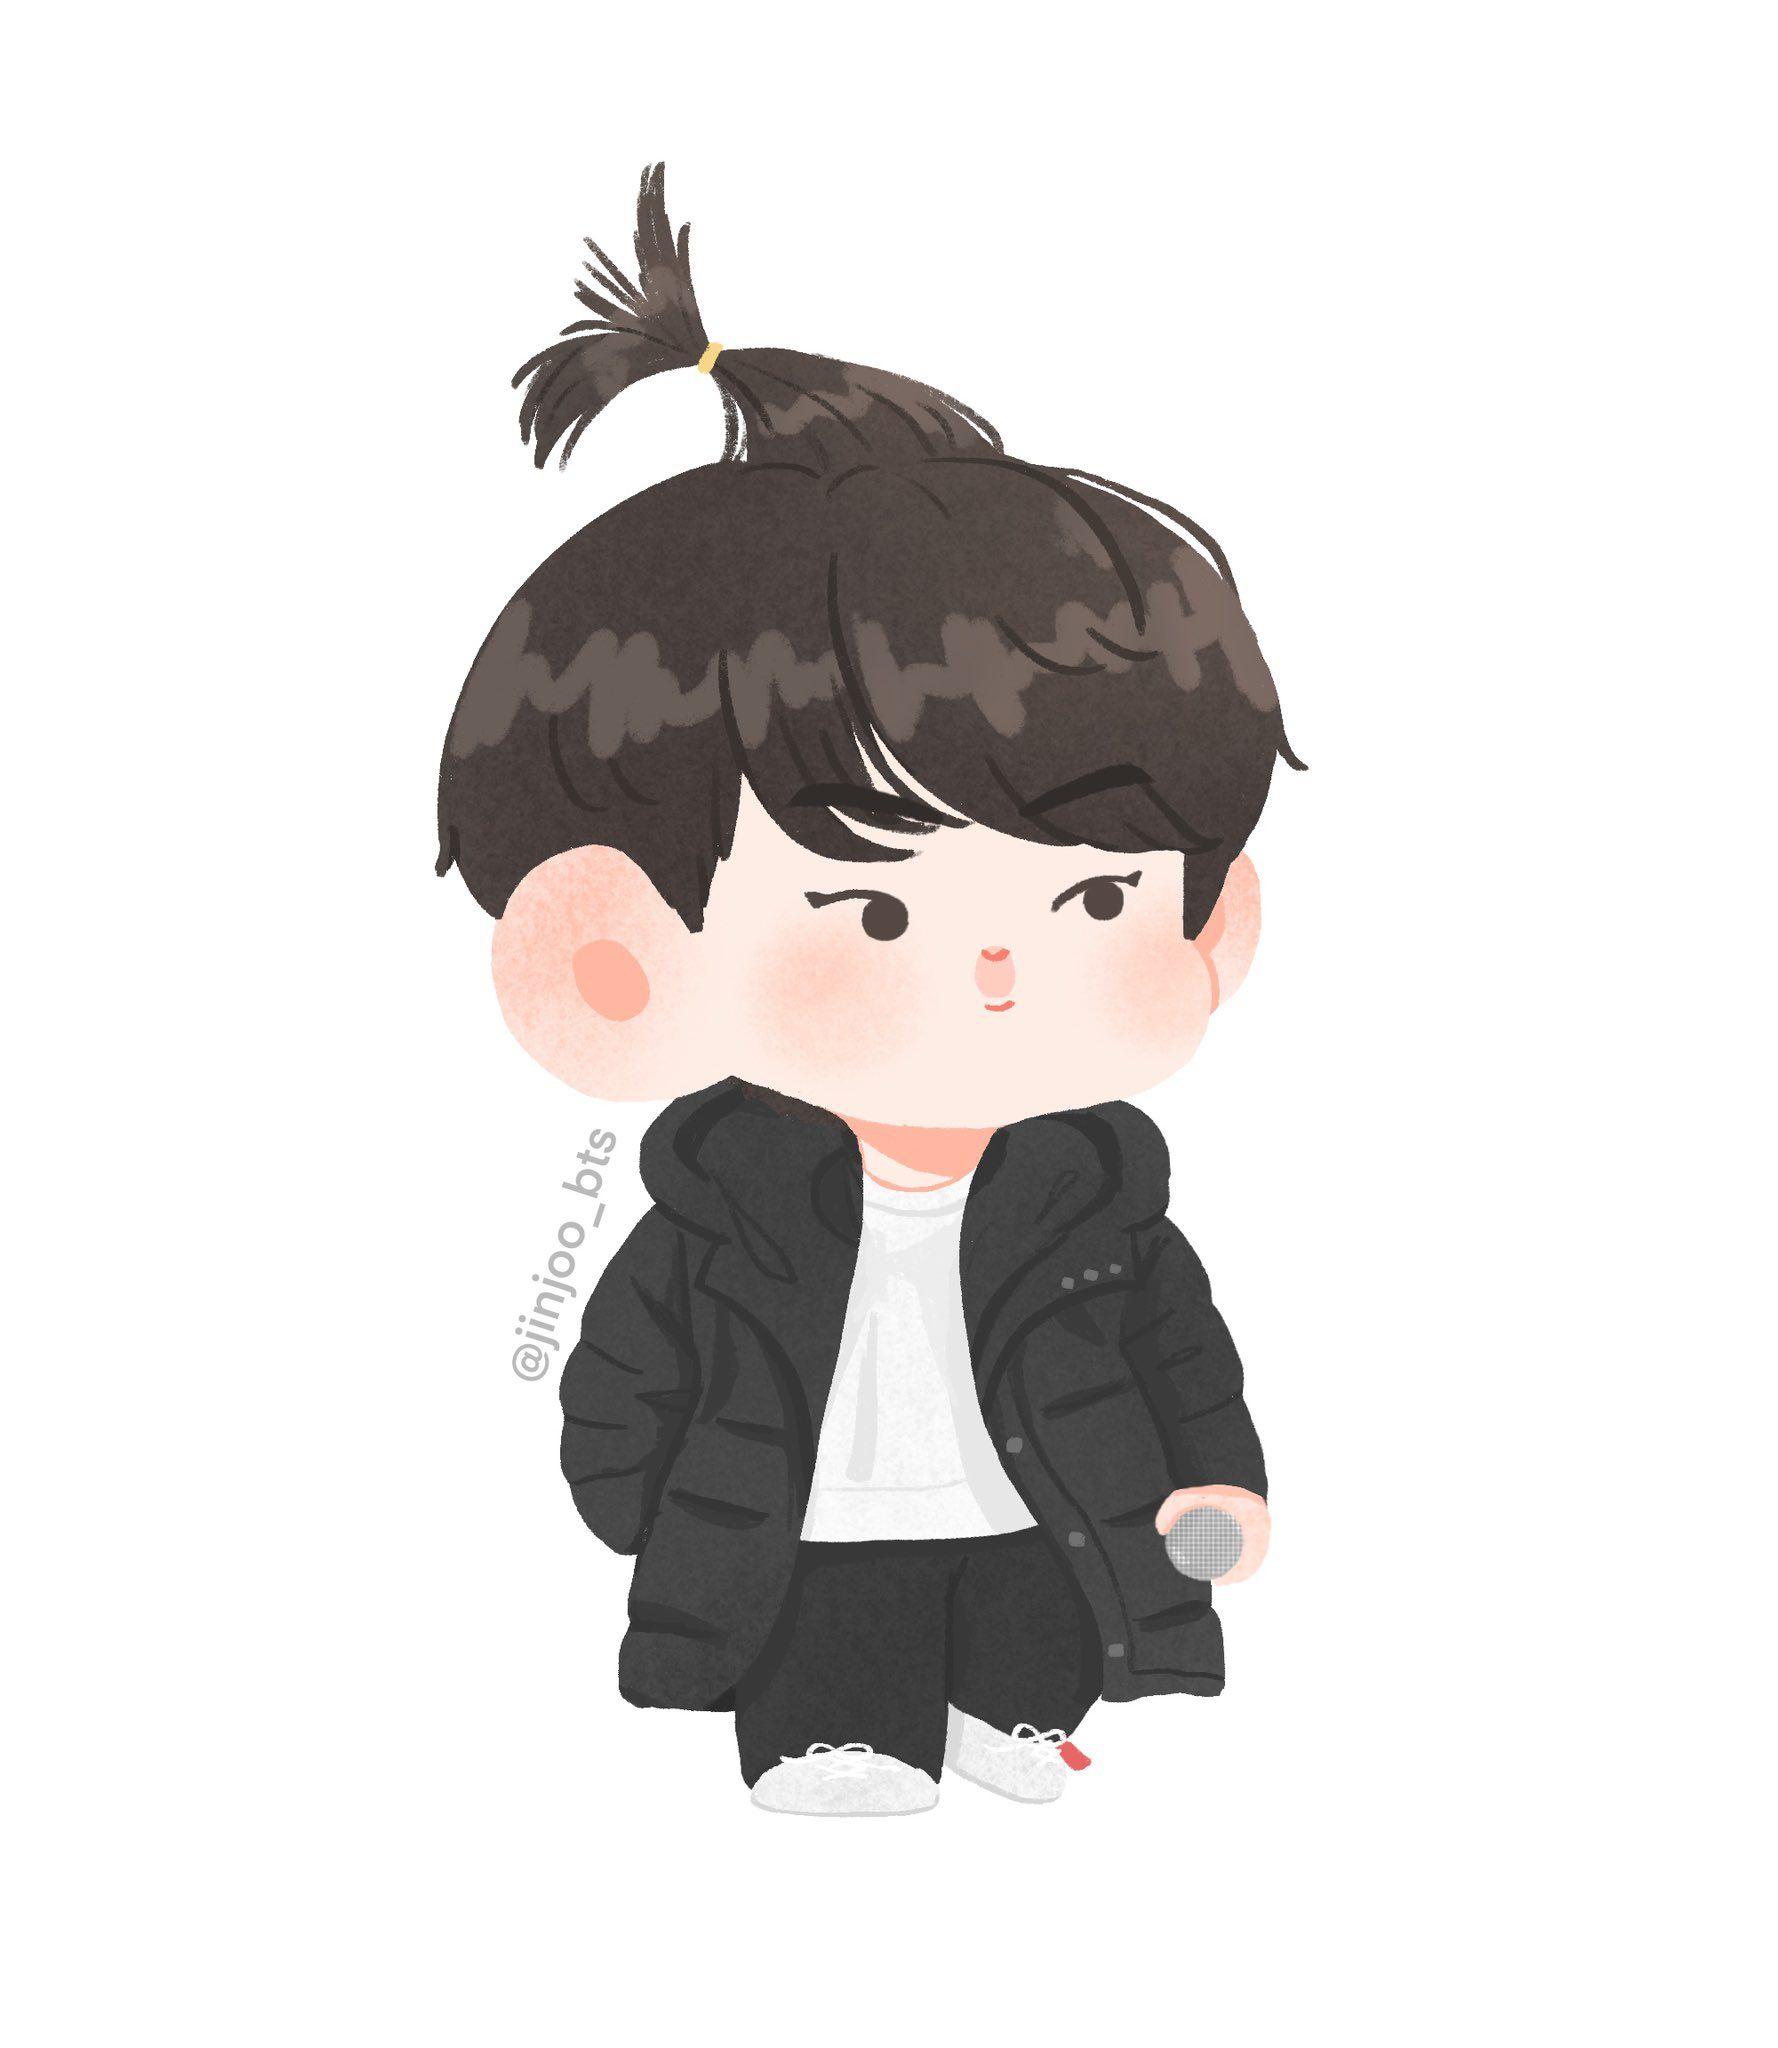 Bts jin cartoon wallpaper